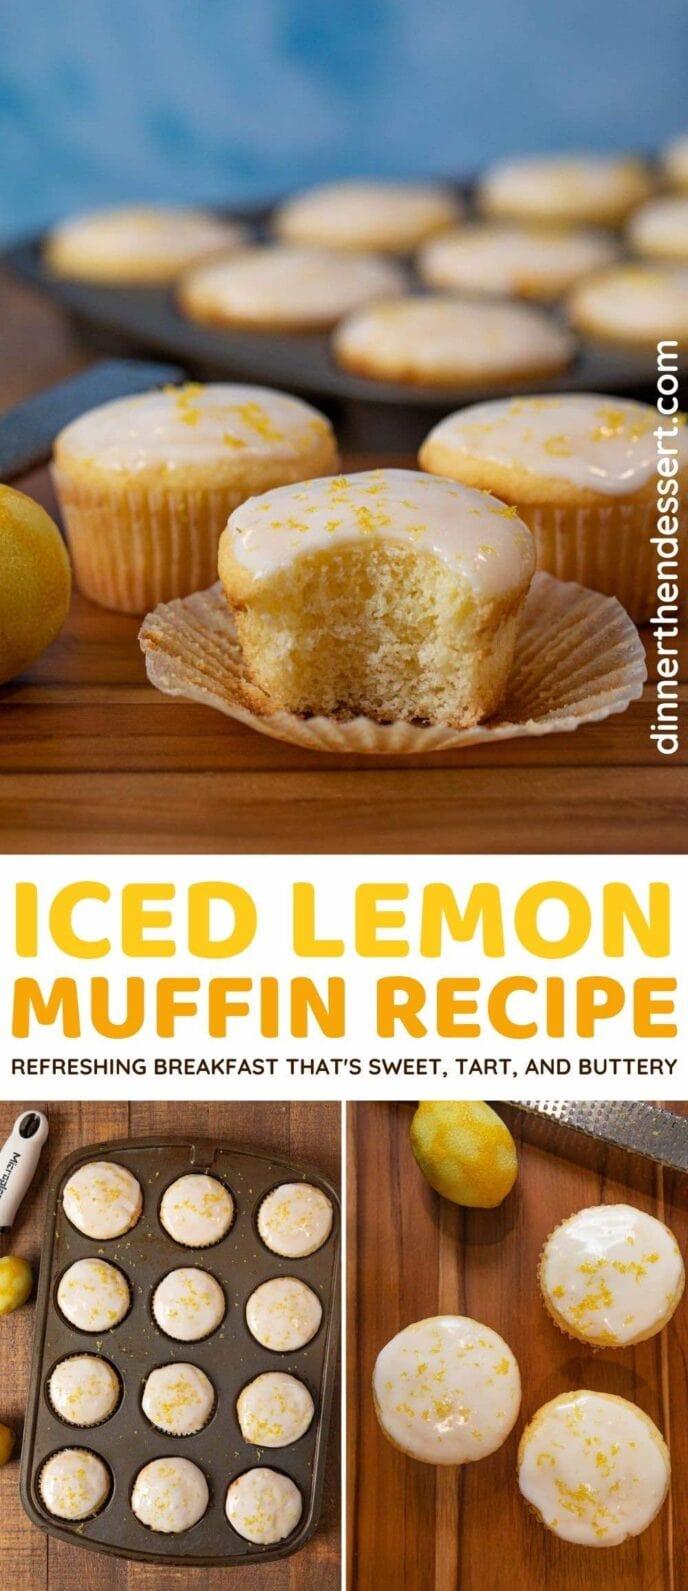 Iced Lemon Muffins